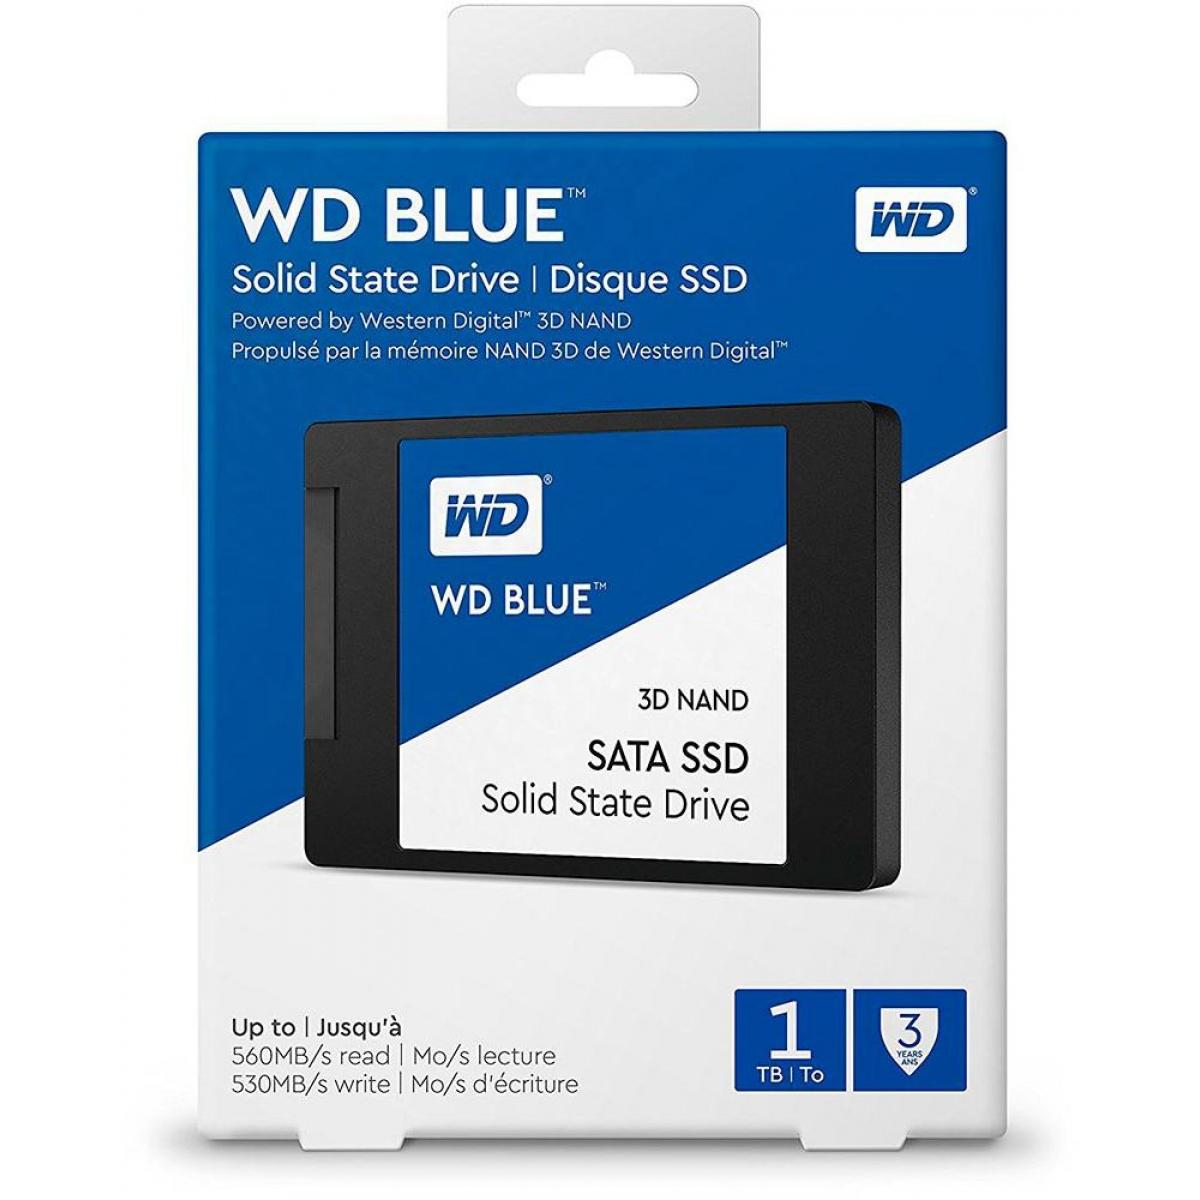 SSD WD Blue 1TB, Sata III, Leitura 560MBs e Gravação 530MBs, WDS100T2B0A